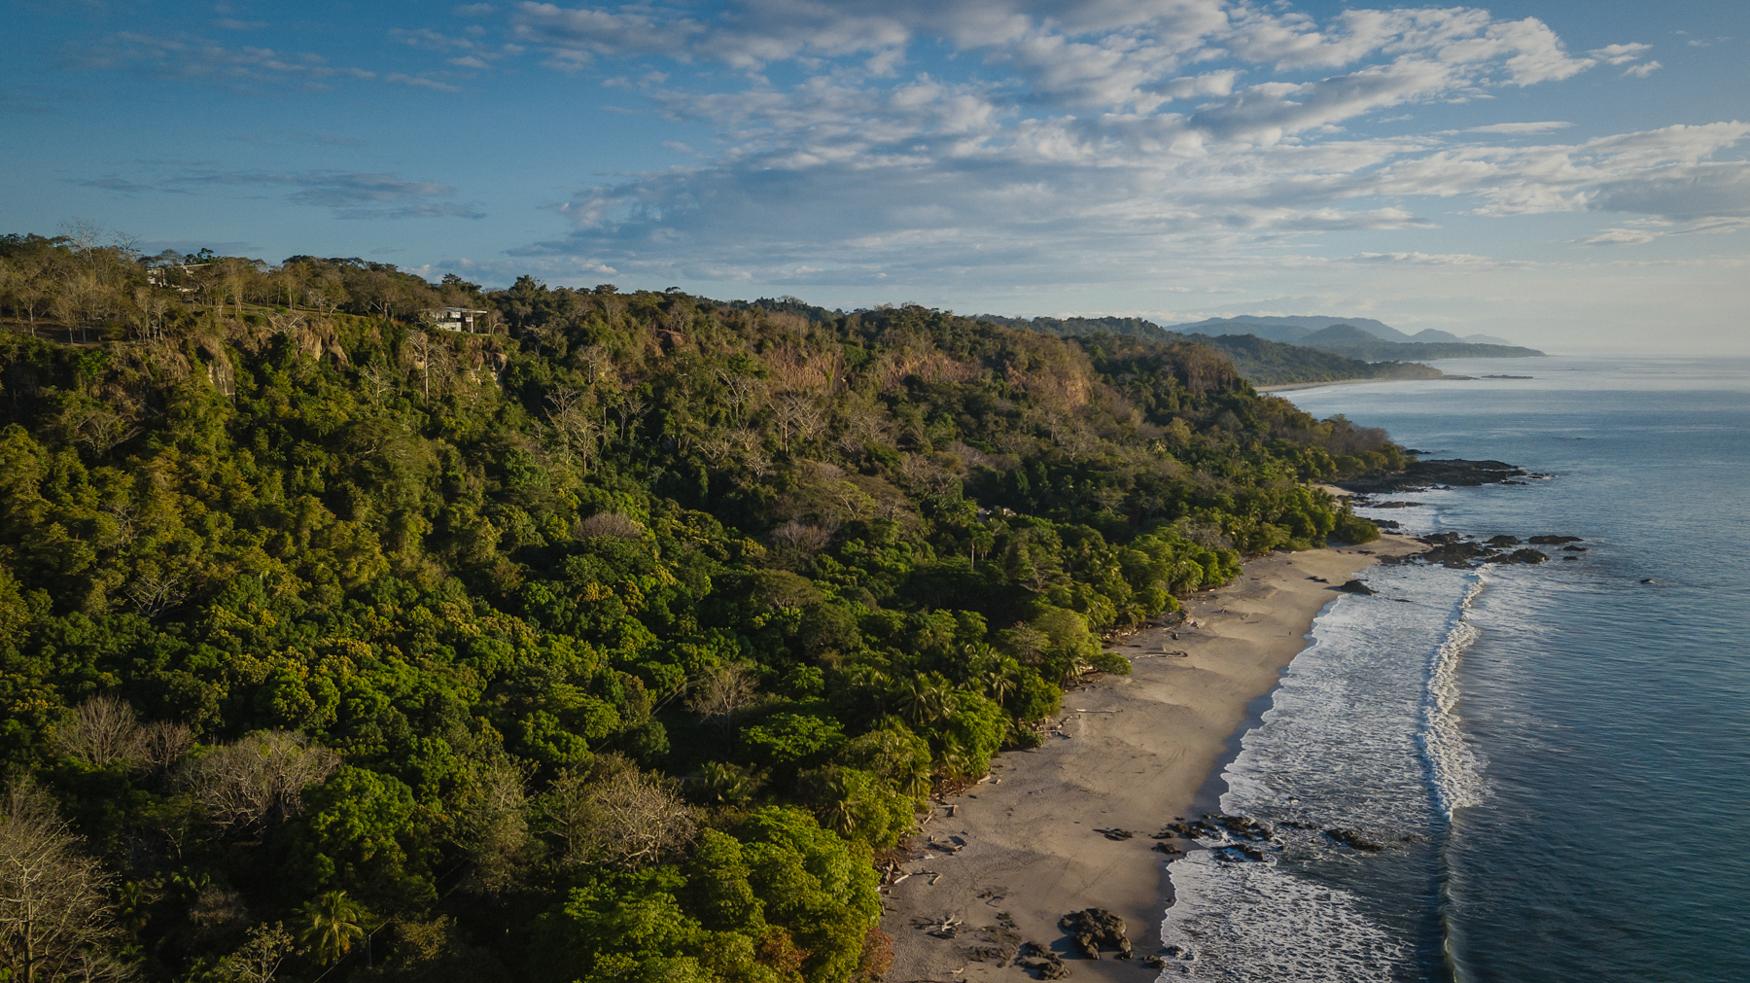 Yoga-Retreat-Drone-Photography-Costa-Rica-4.jpg